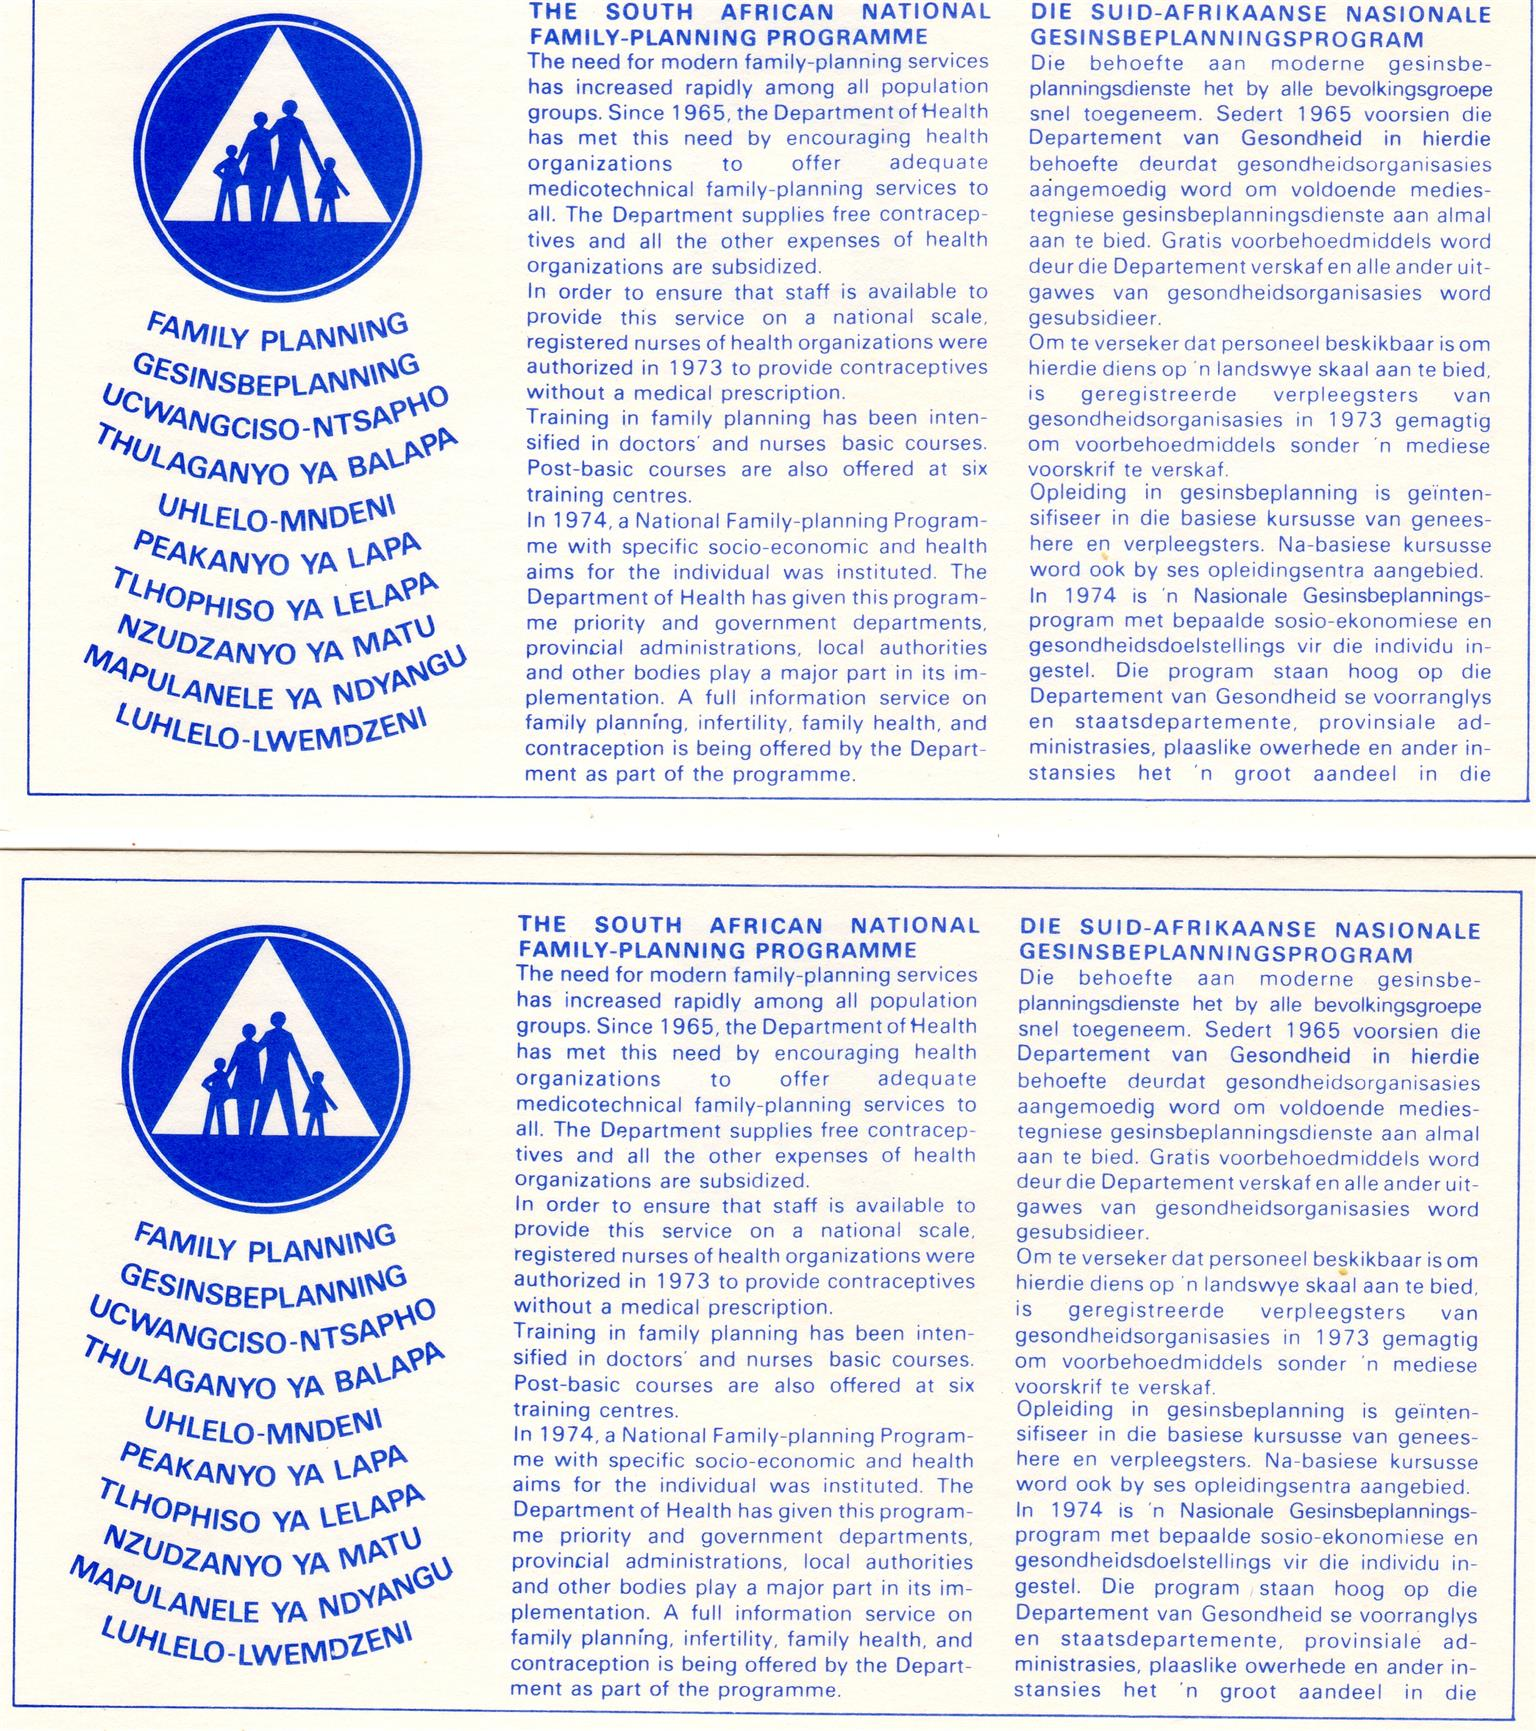 Commemorative Stamp & Envelope Set - Our Childrens Day 1976